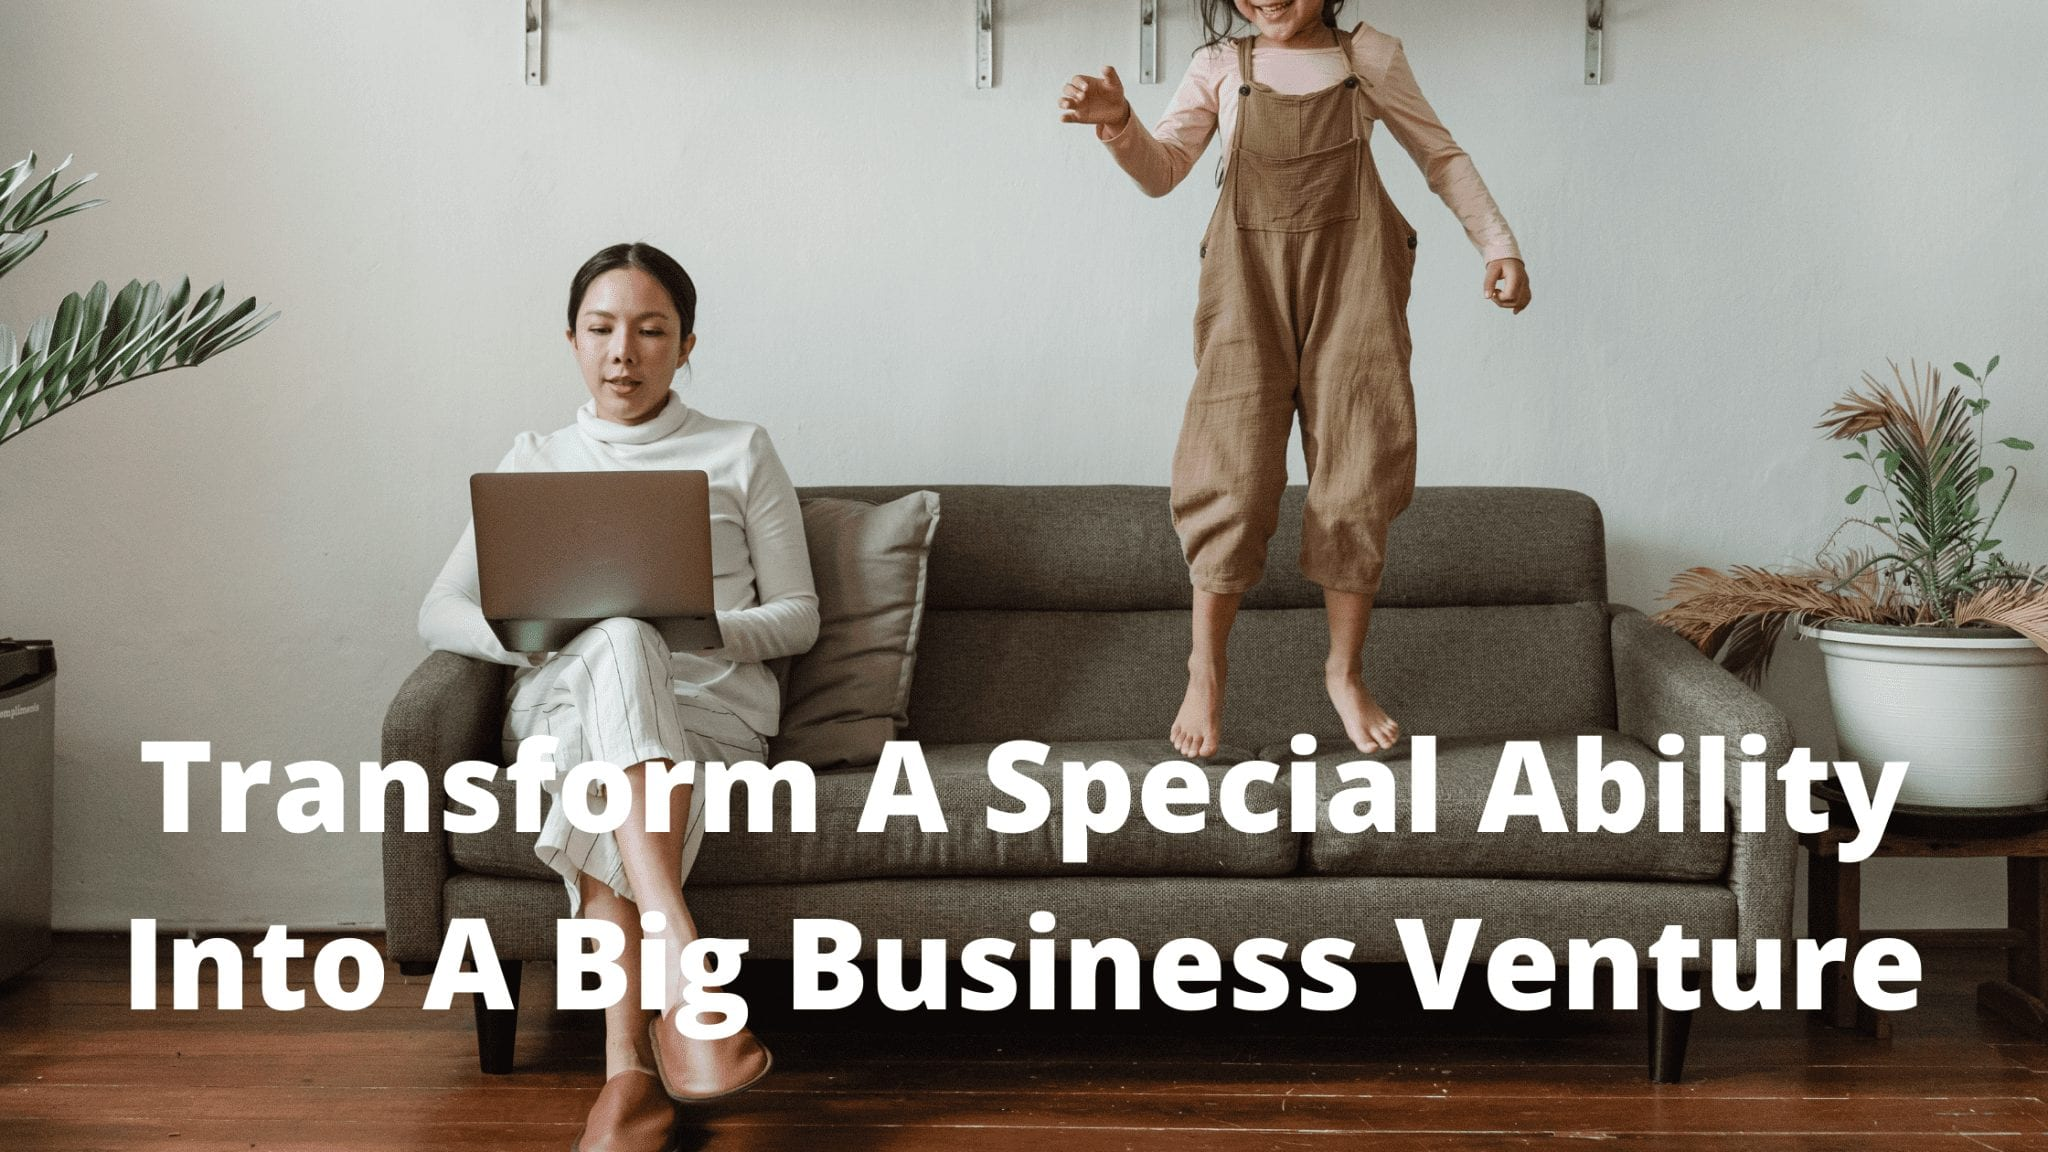 Transform A Special Ability Into A Big Business Venture